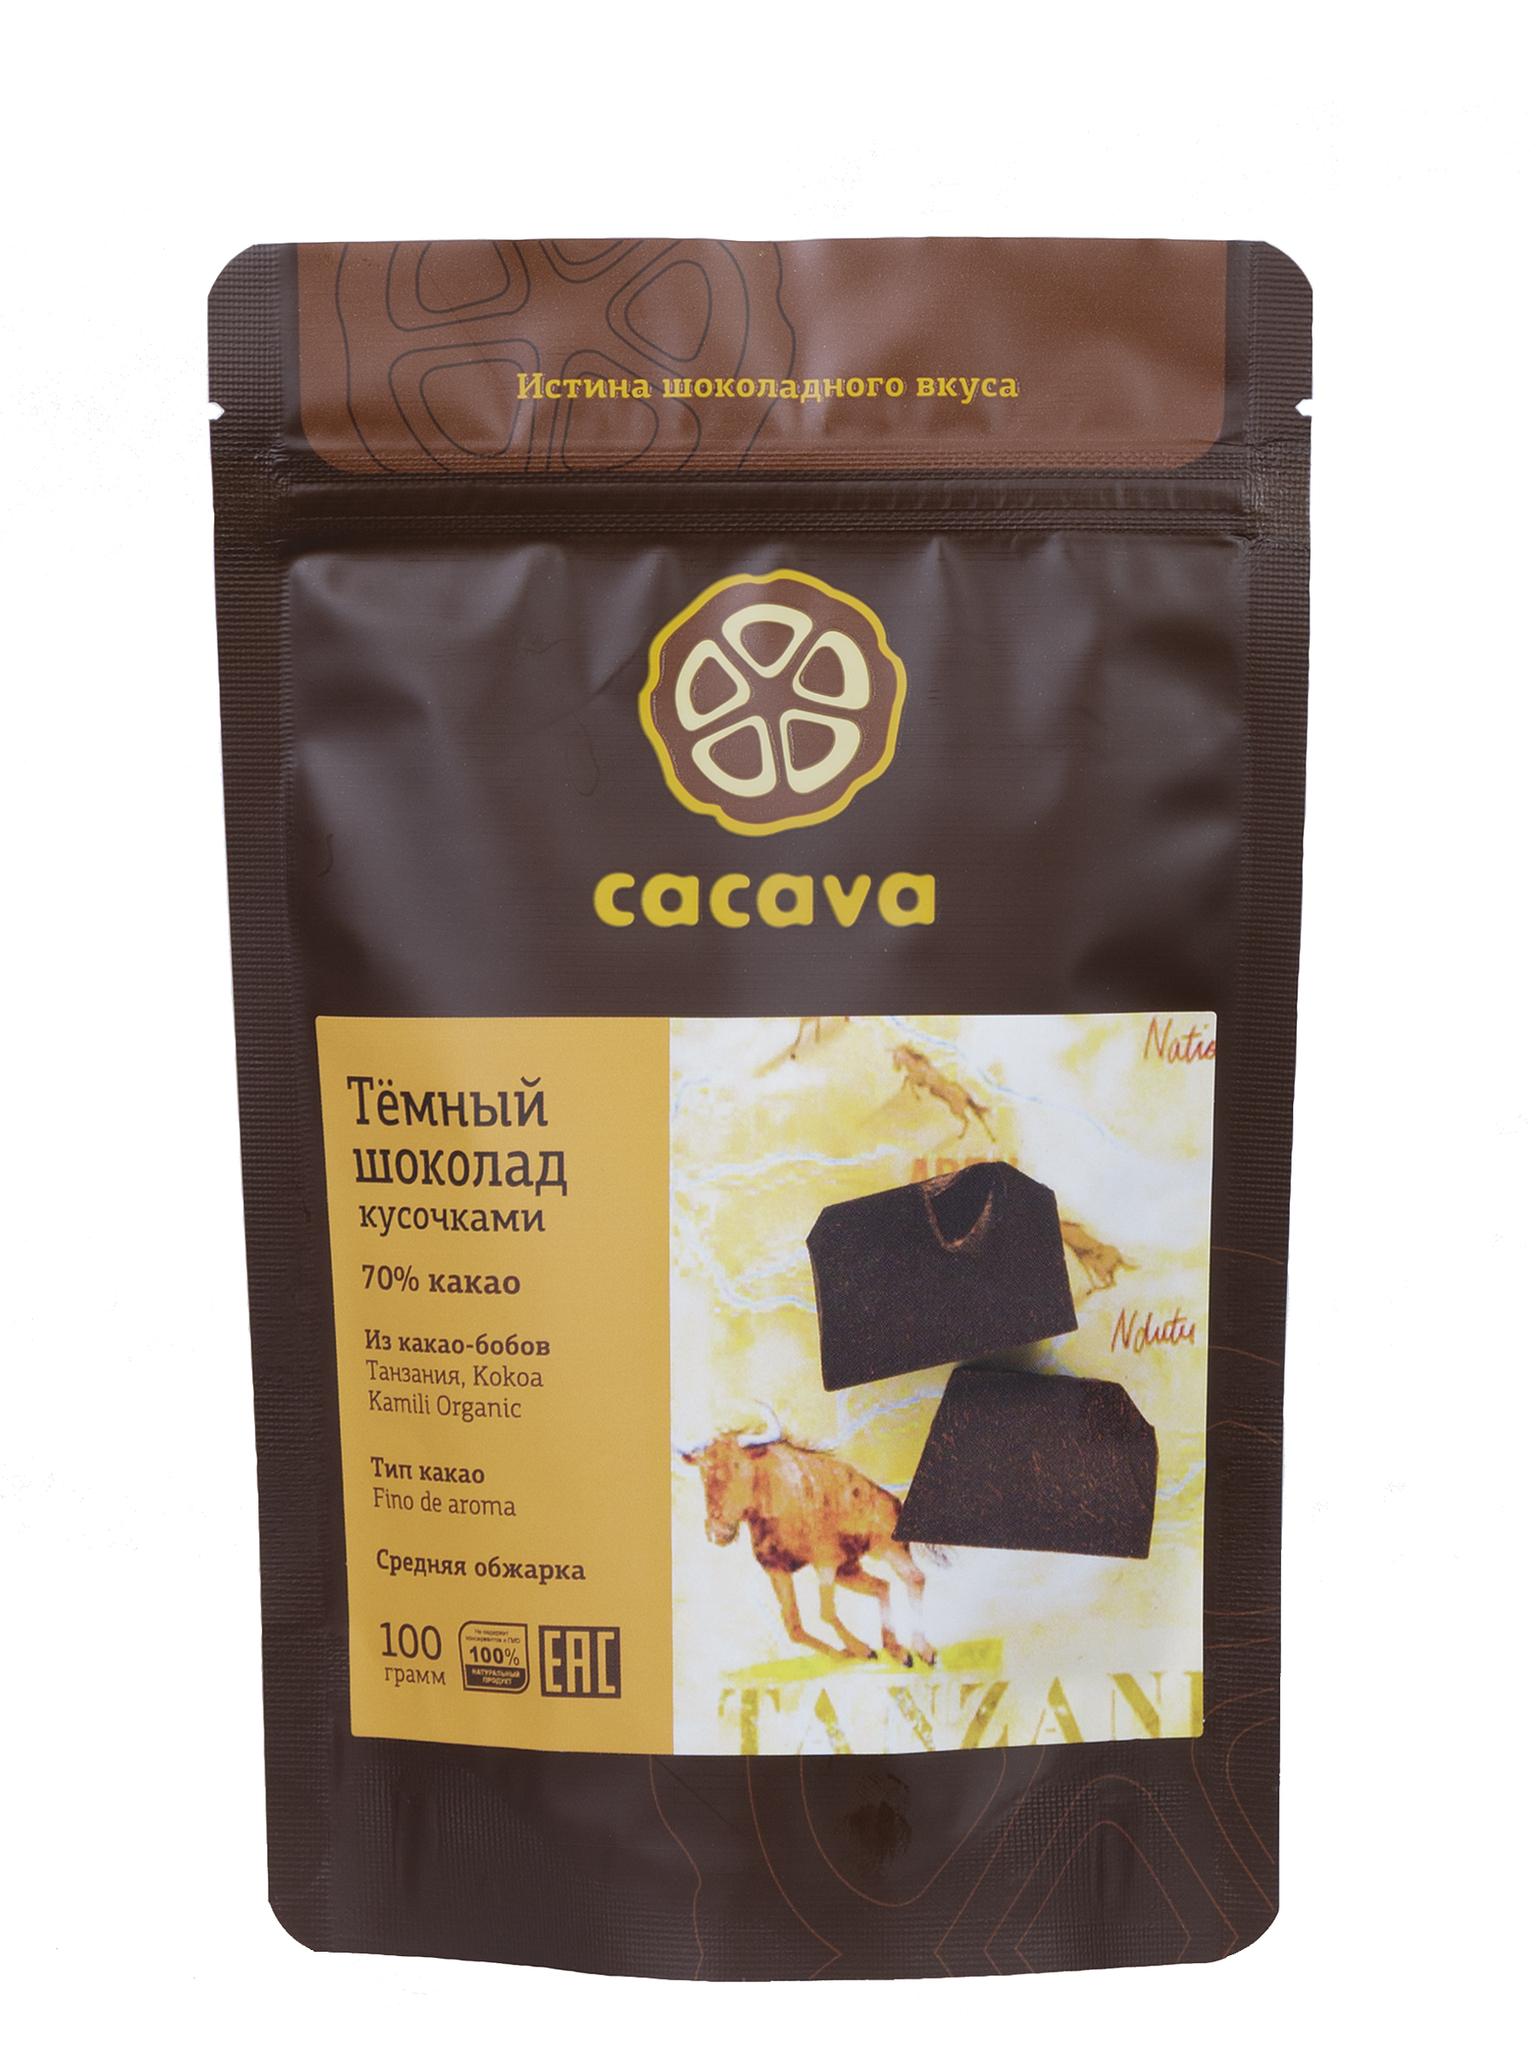 Тёмный шоколад 70 % какао (Танзания, Kokoa Kamili), упаковка 100 грамм